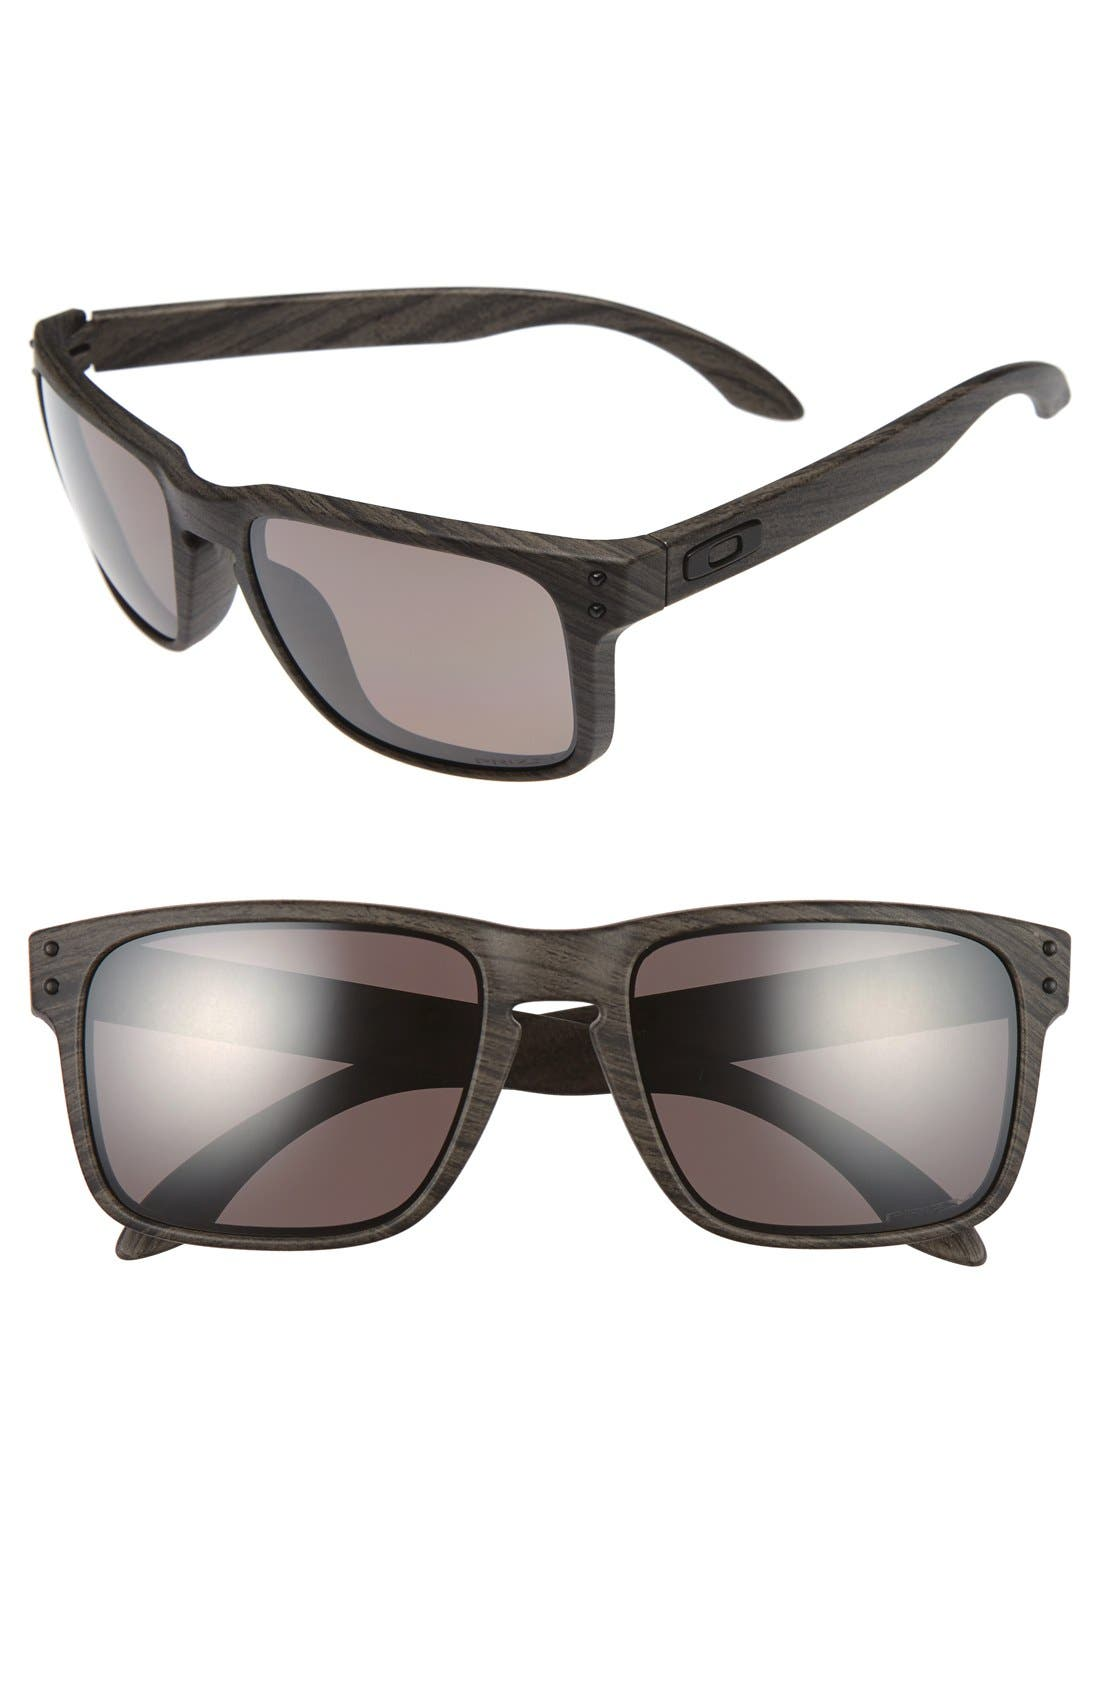 OAKLEY Holbrook 55mm Polarized Sunglasses